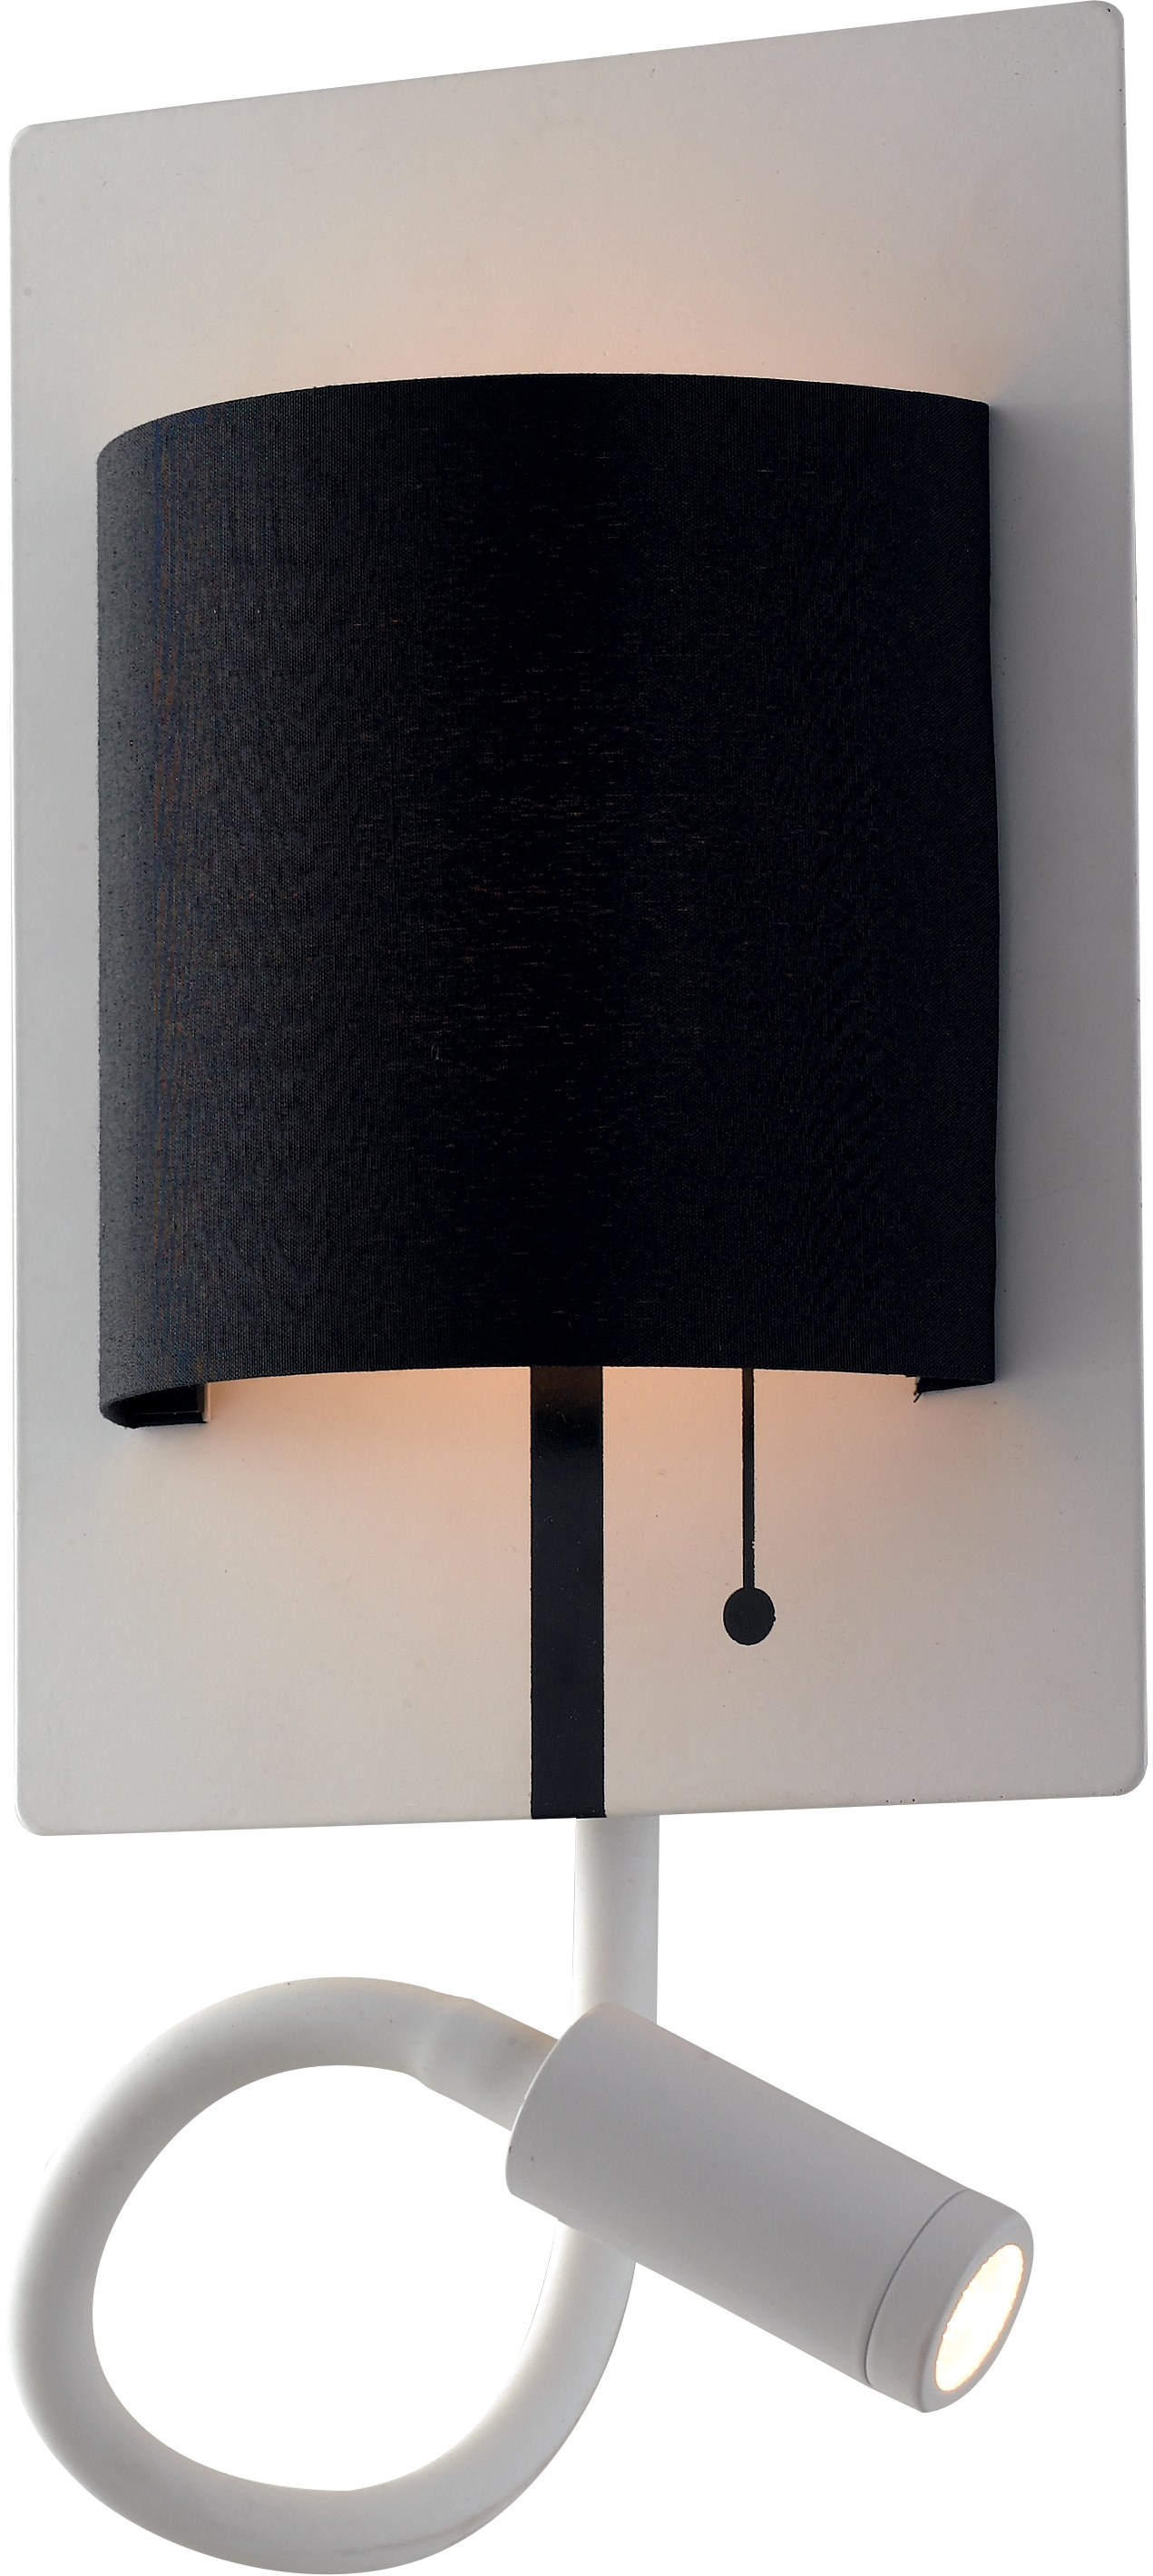 LUCE Design LED Wandleuchte LED-POP-WB, LED-Modul, 1 St., Neutralweiß